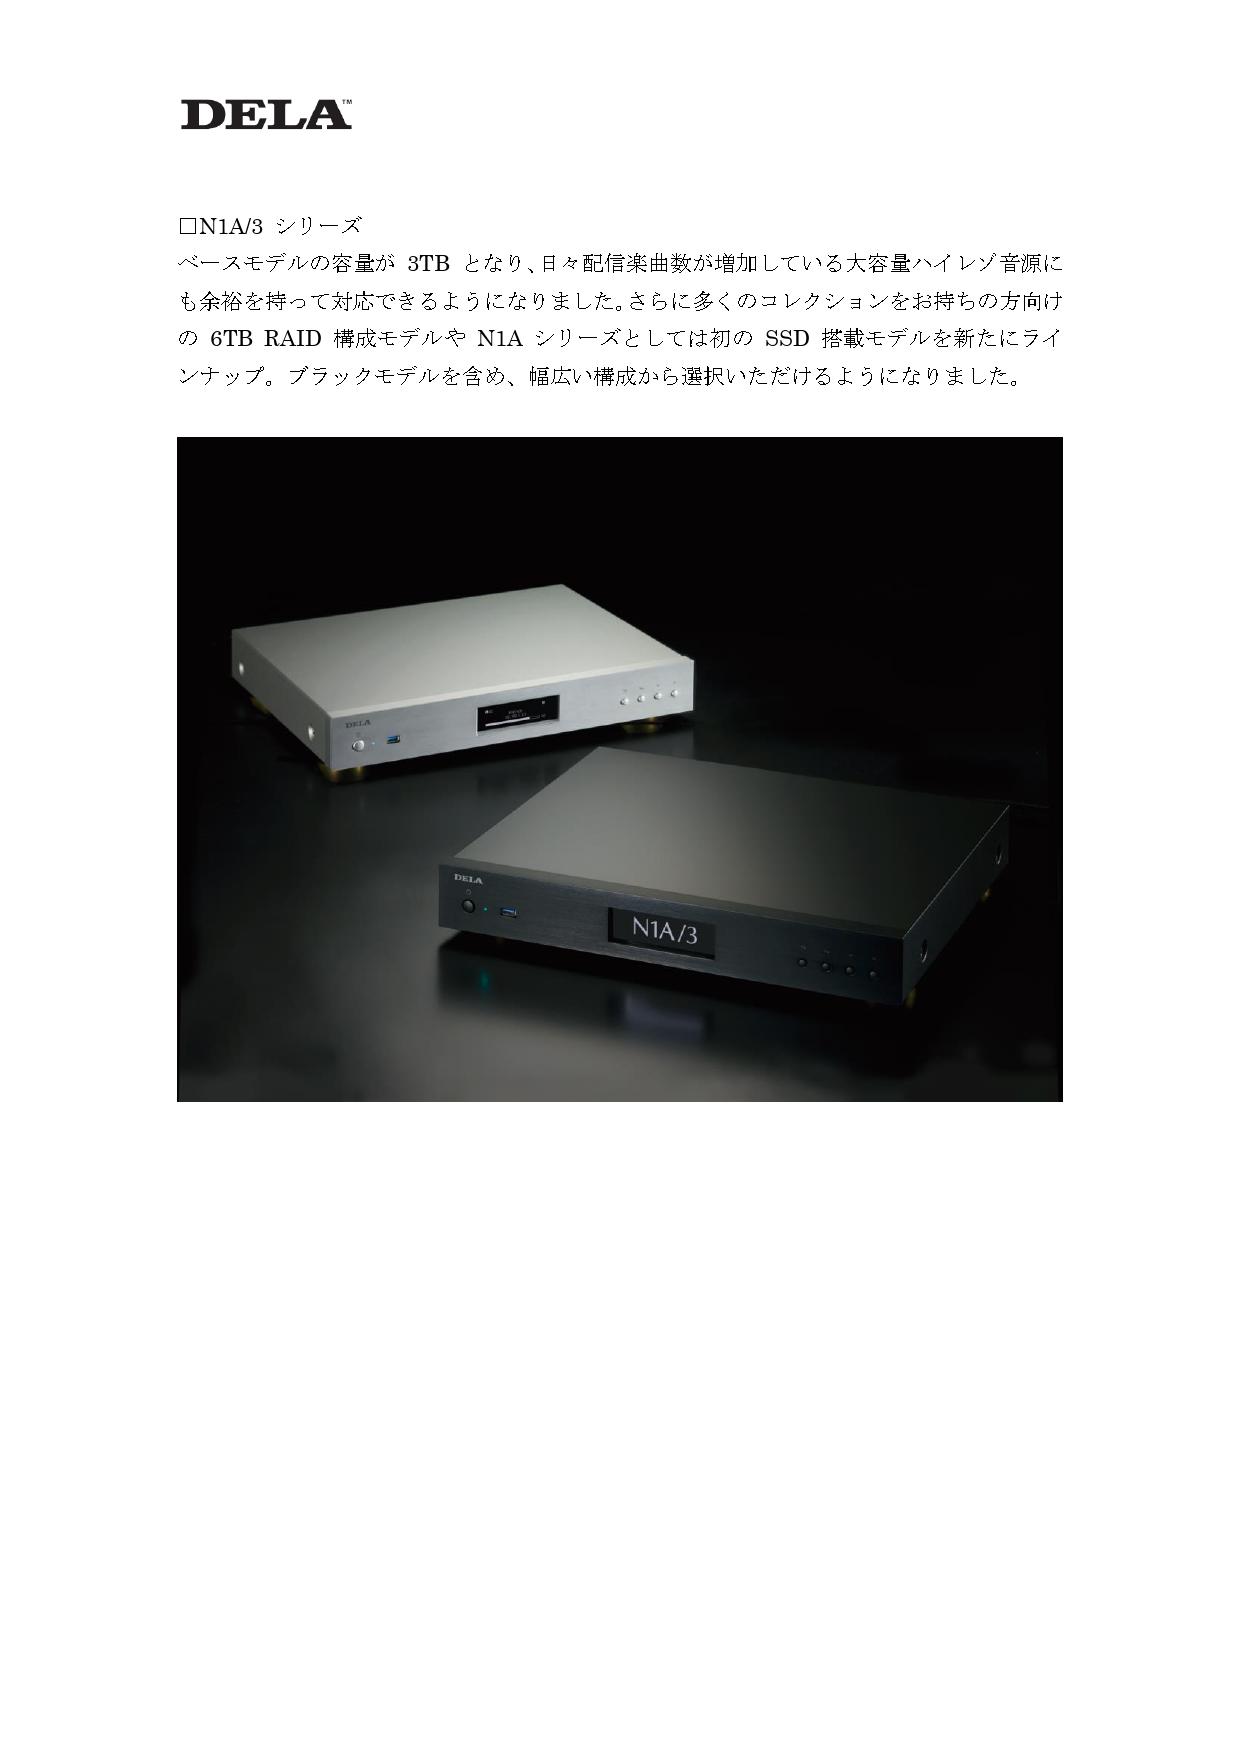 DELA 新製品 N1 MK3, S100_page-0002